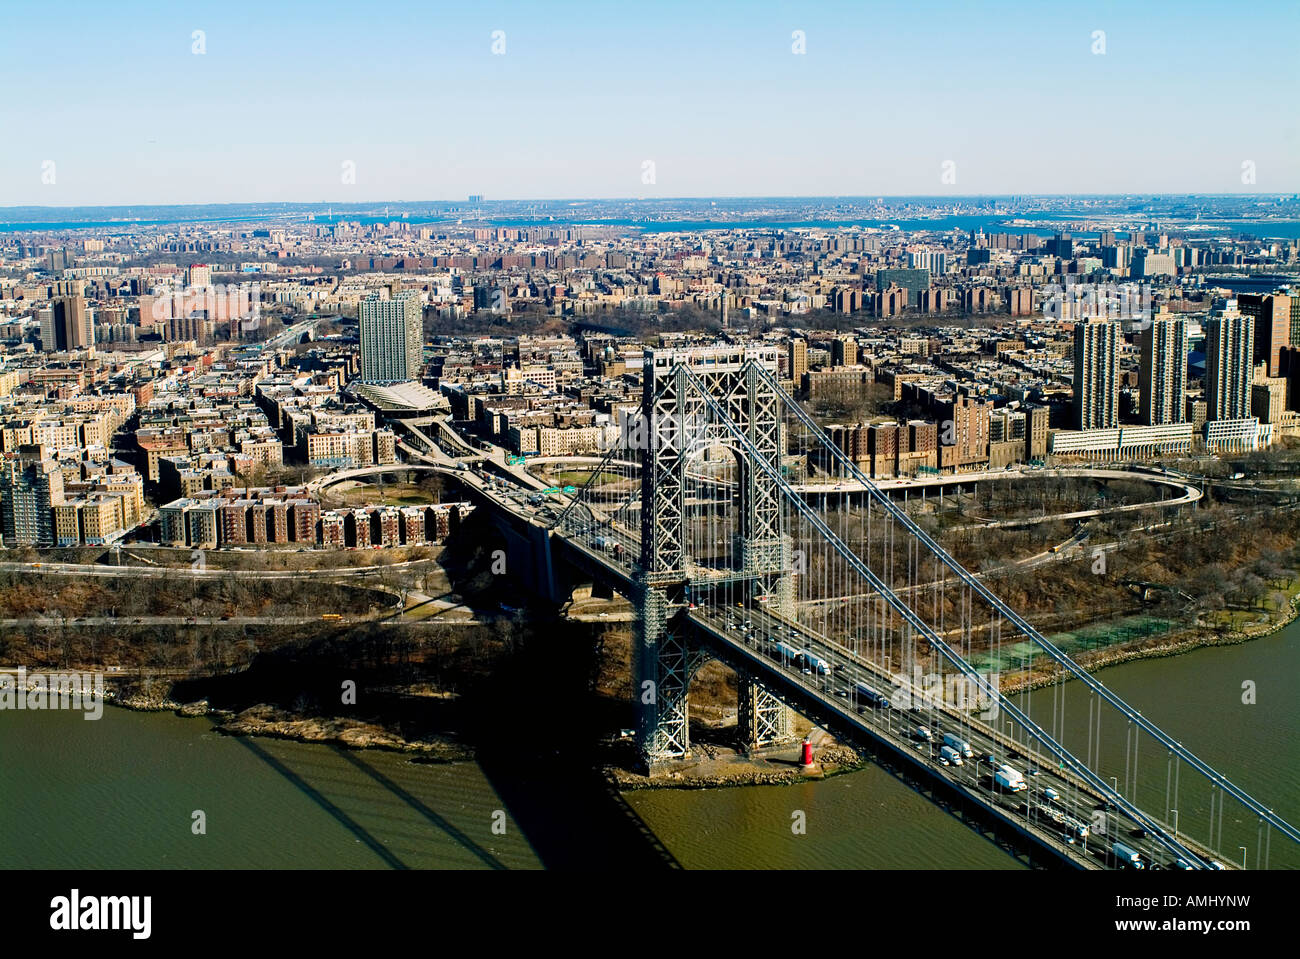 aerial view above George Washington bridge, Manhattan, New York city - Stock Image